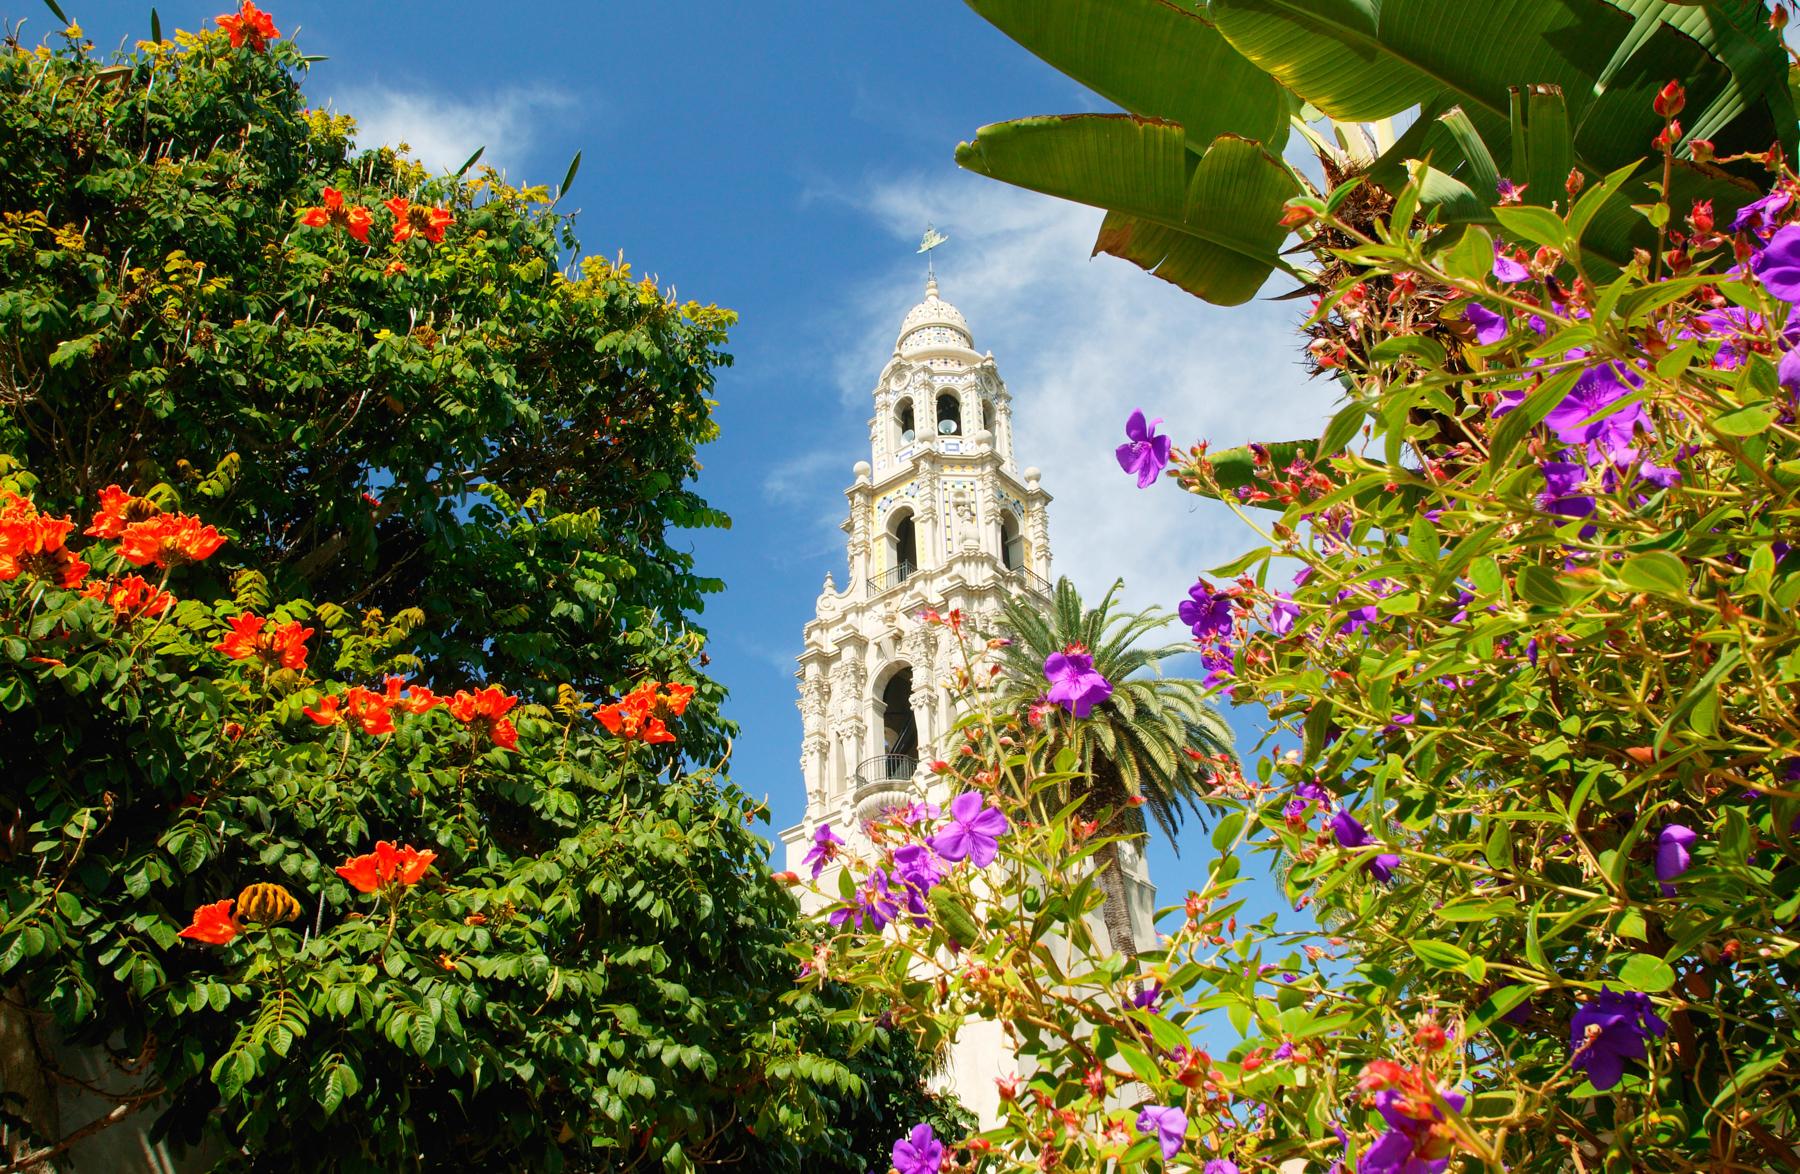 Ornate tower seen through flowers (Alamy)